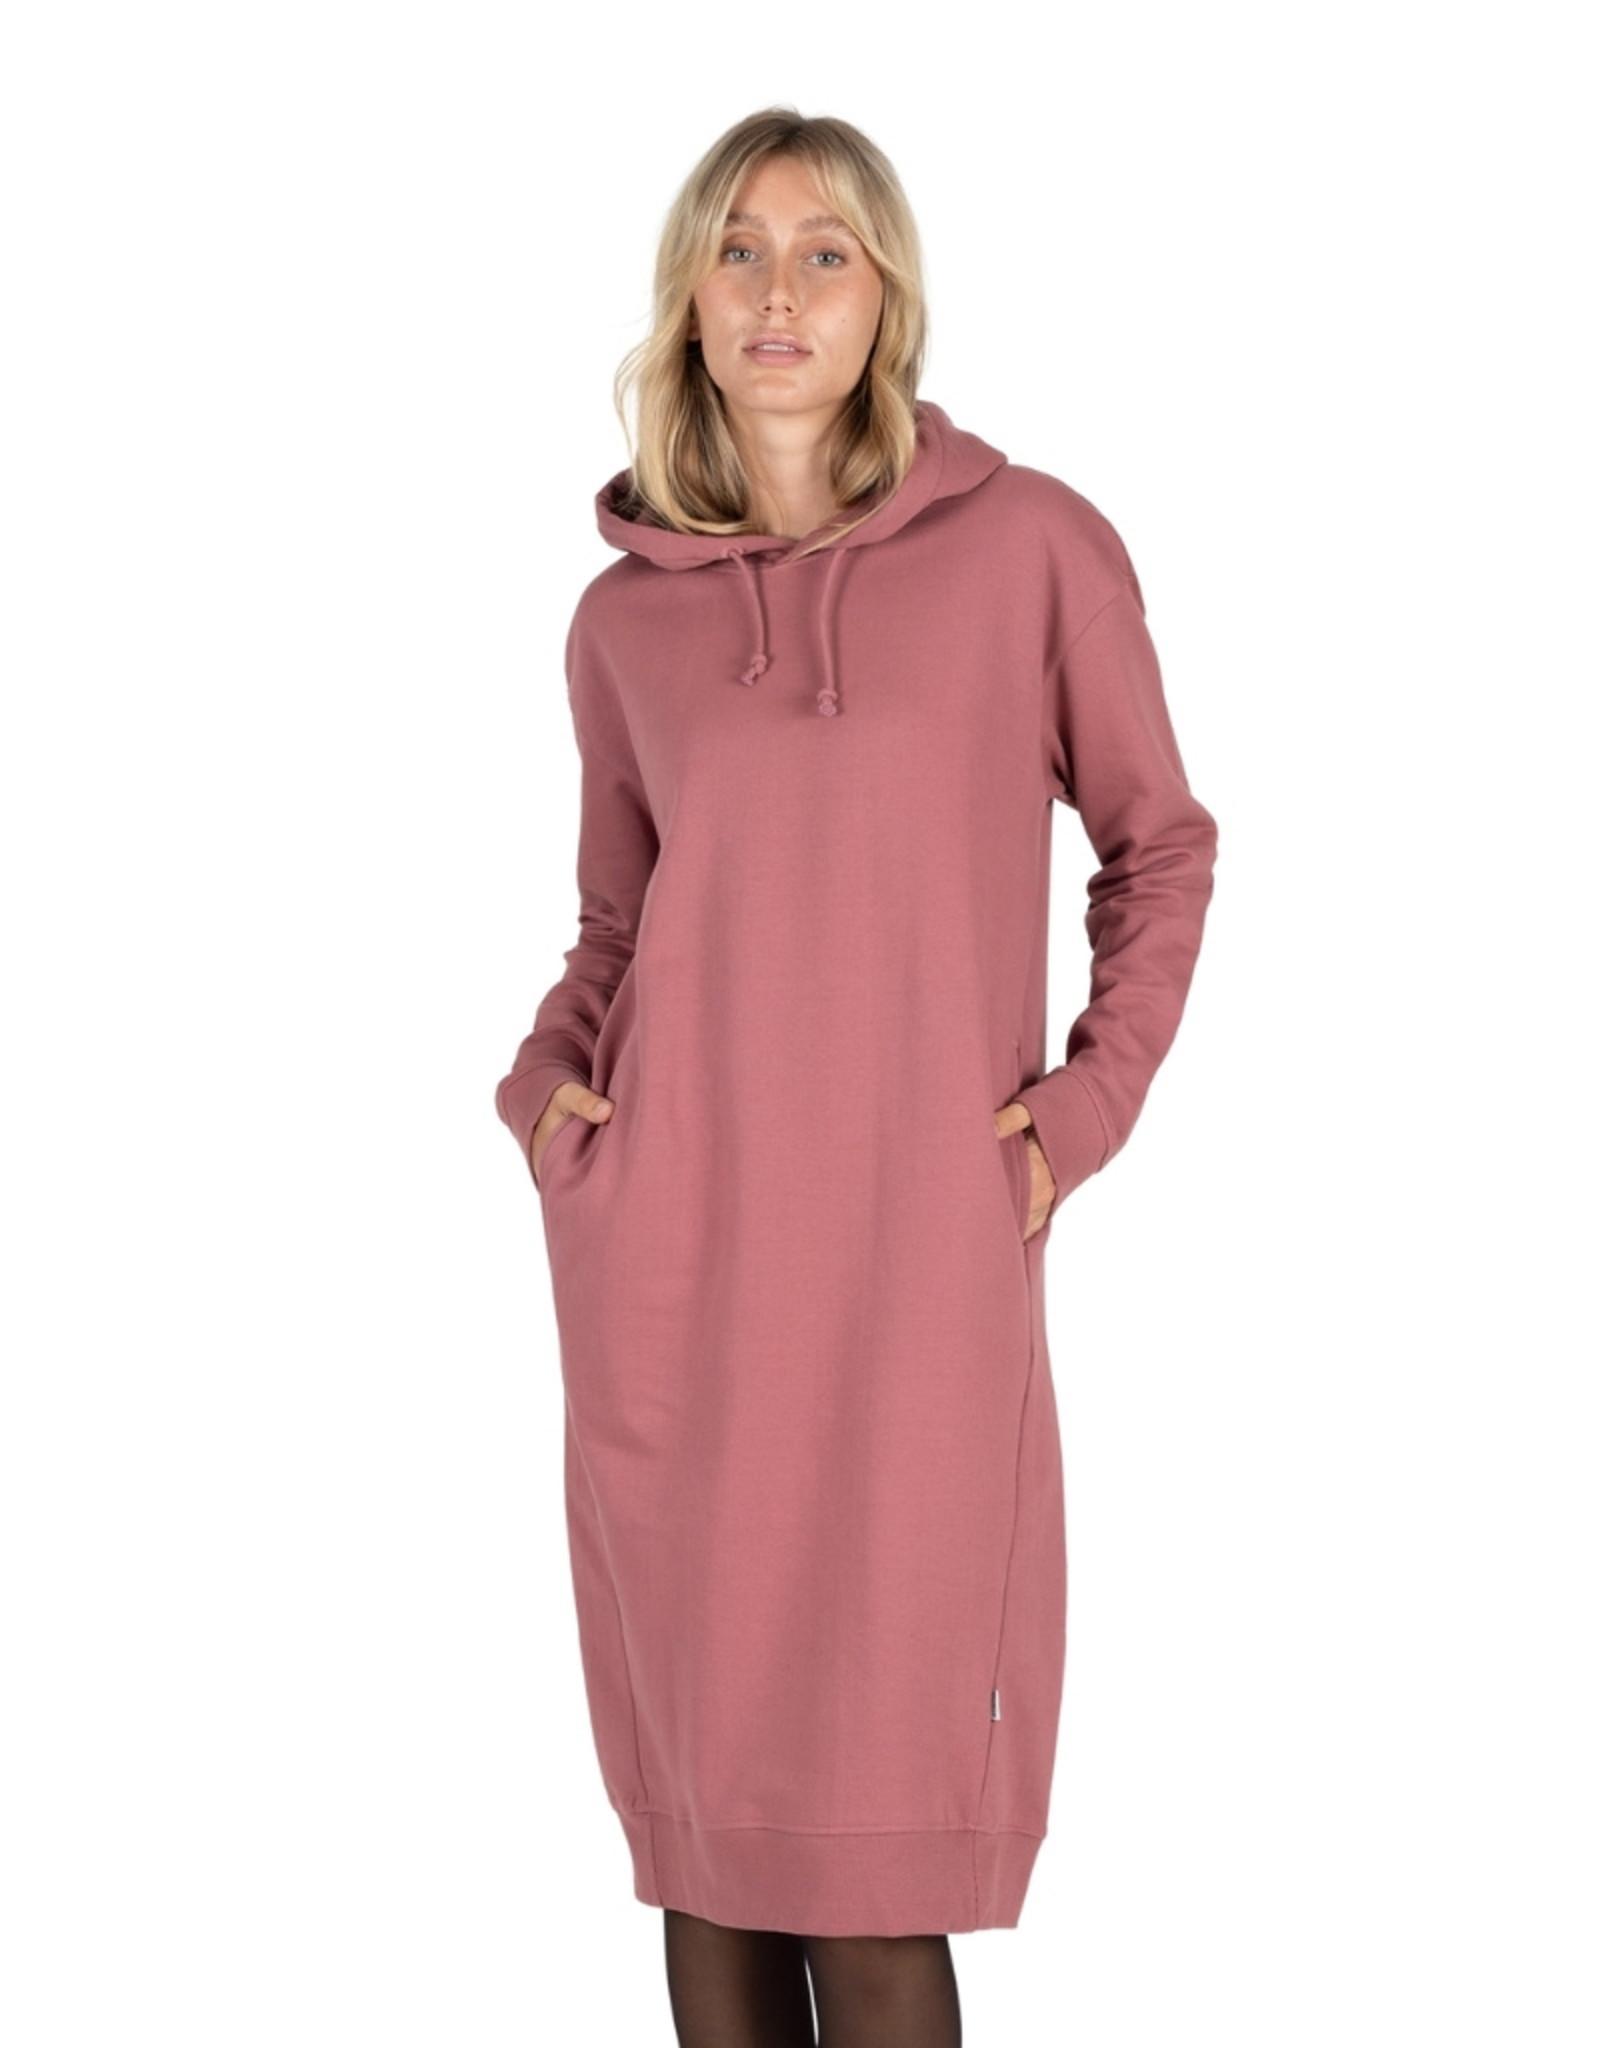 Wemoto - RUBY (HOODED DRESS)